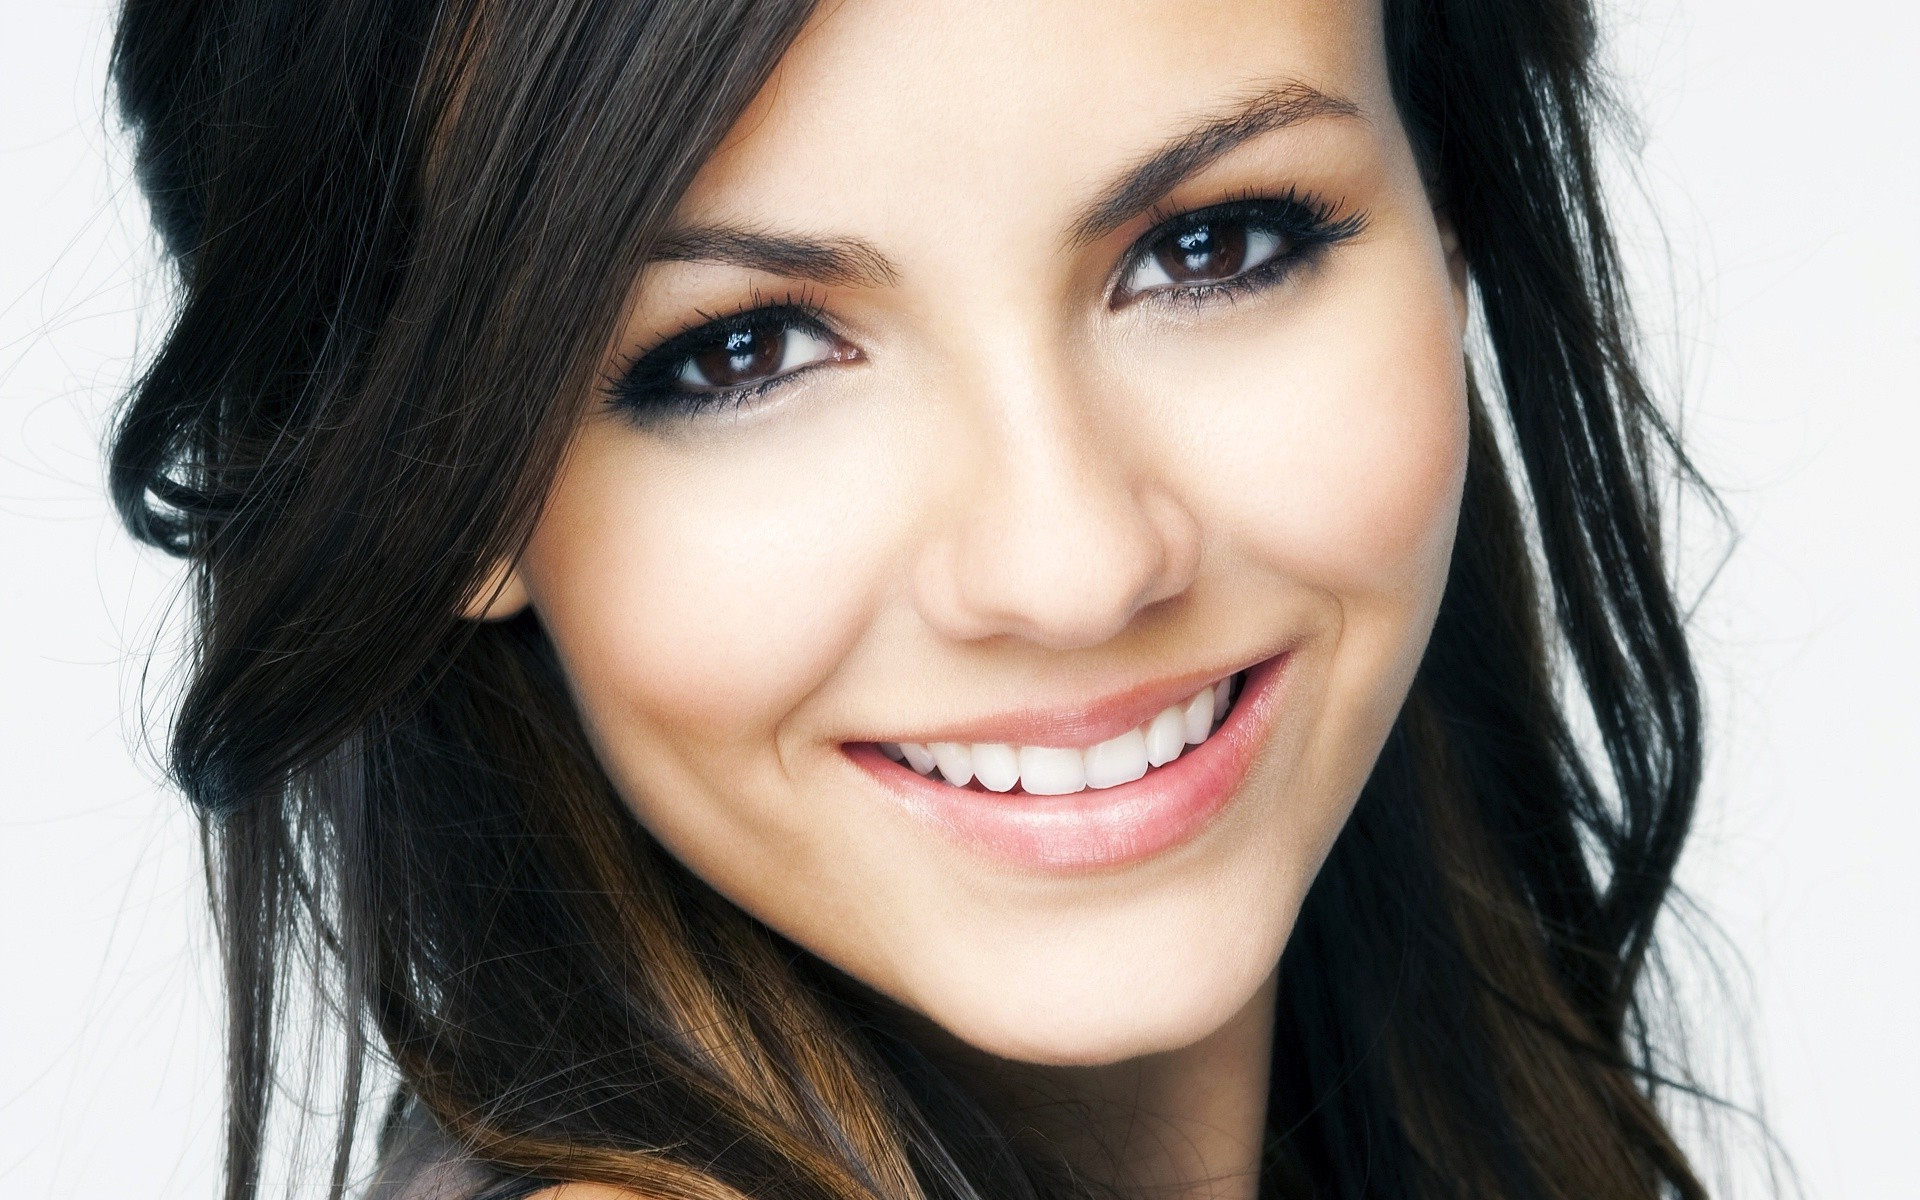 Victoria Justice Smile